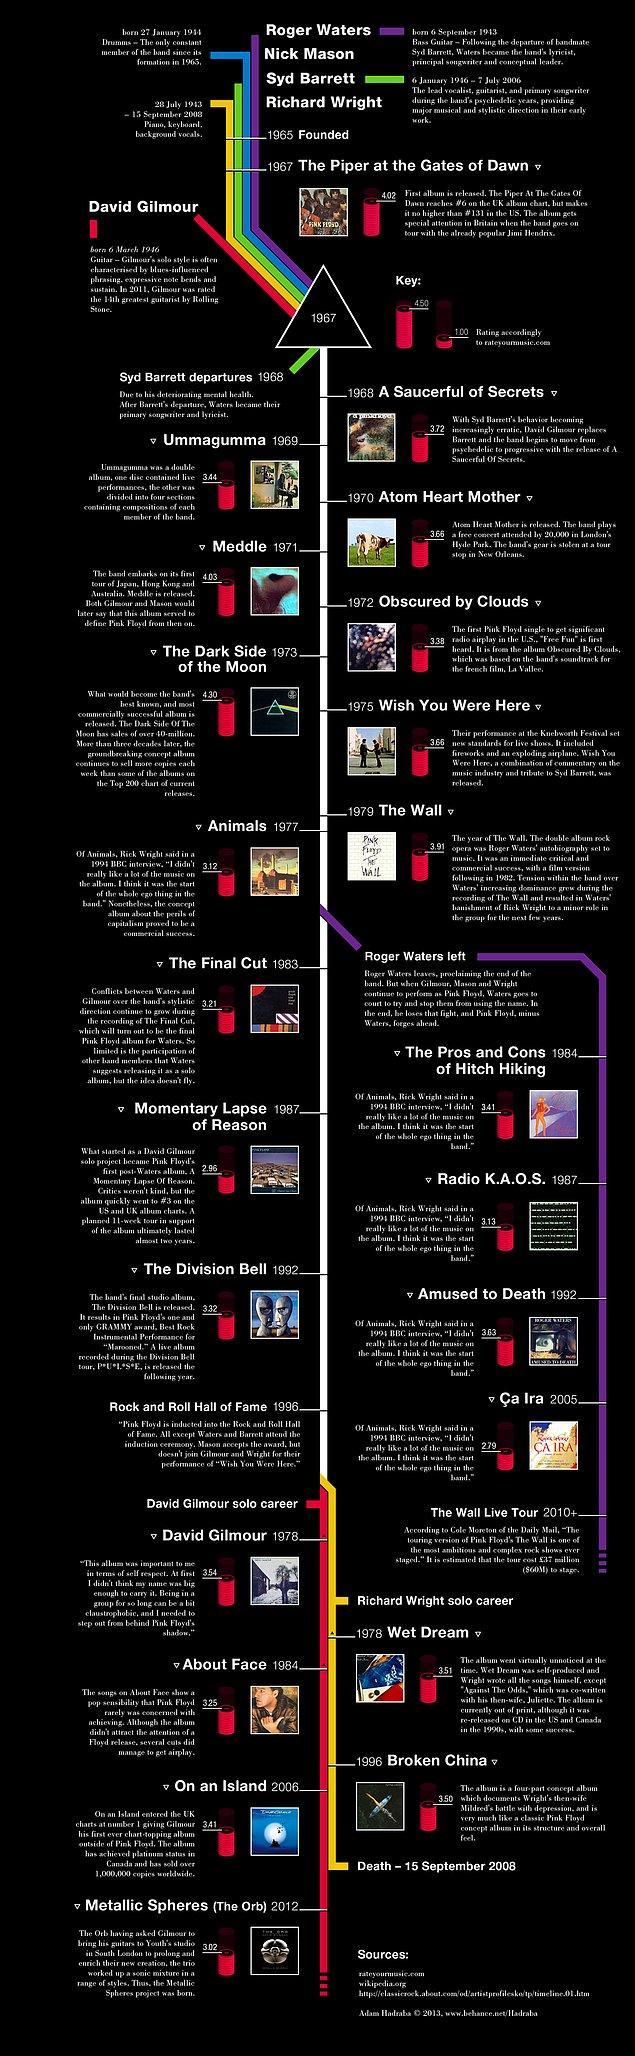 44. Pink Floyd kronolojisi